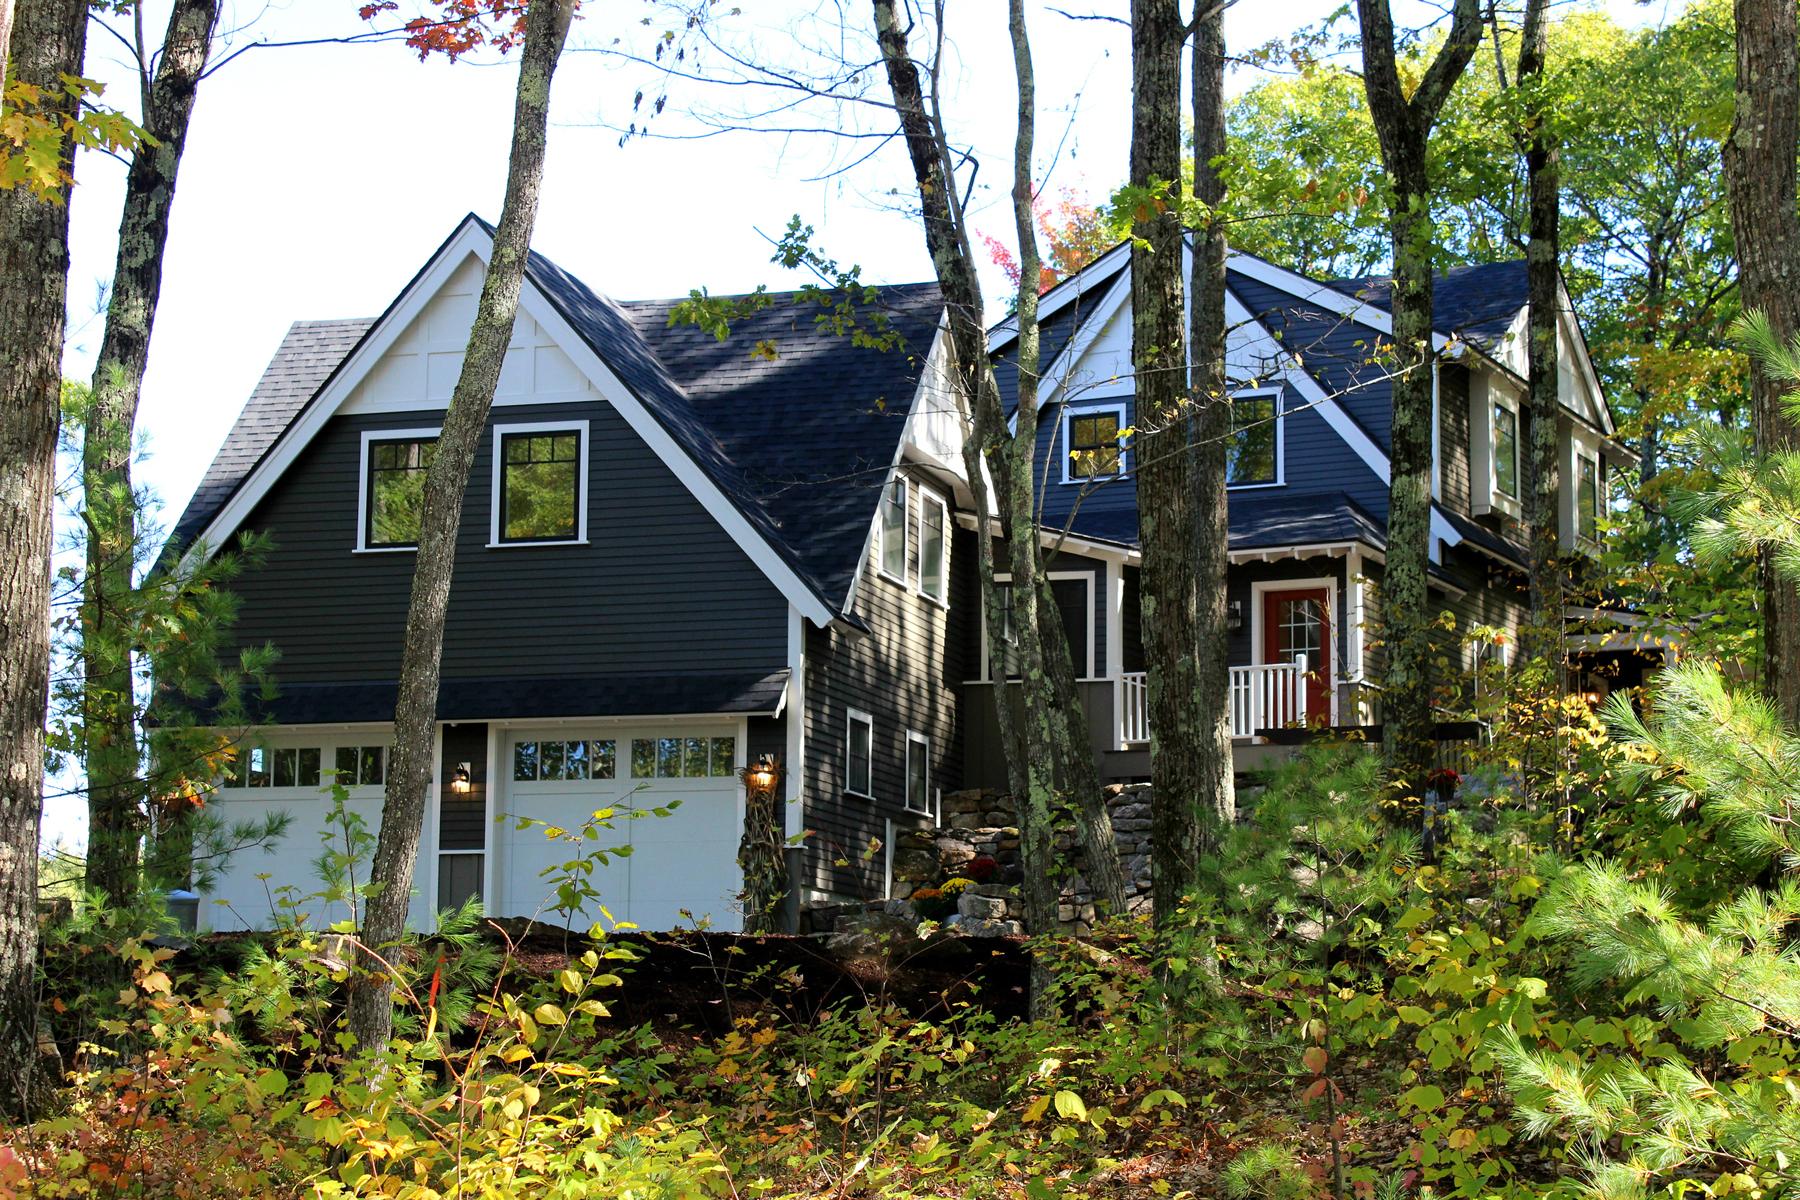 獨棟家庭住宅 為 出售 在 8 Peaked Hill Road, Ashland 8 Peaked Hill Rd Ashland, 新罕布什爾州, 03217 美國